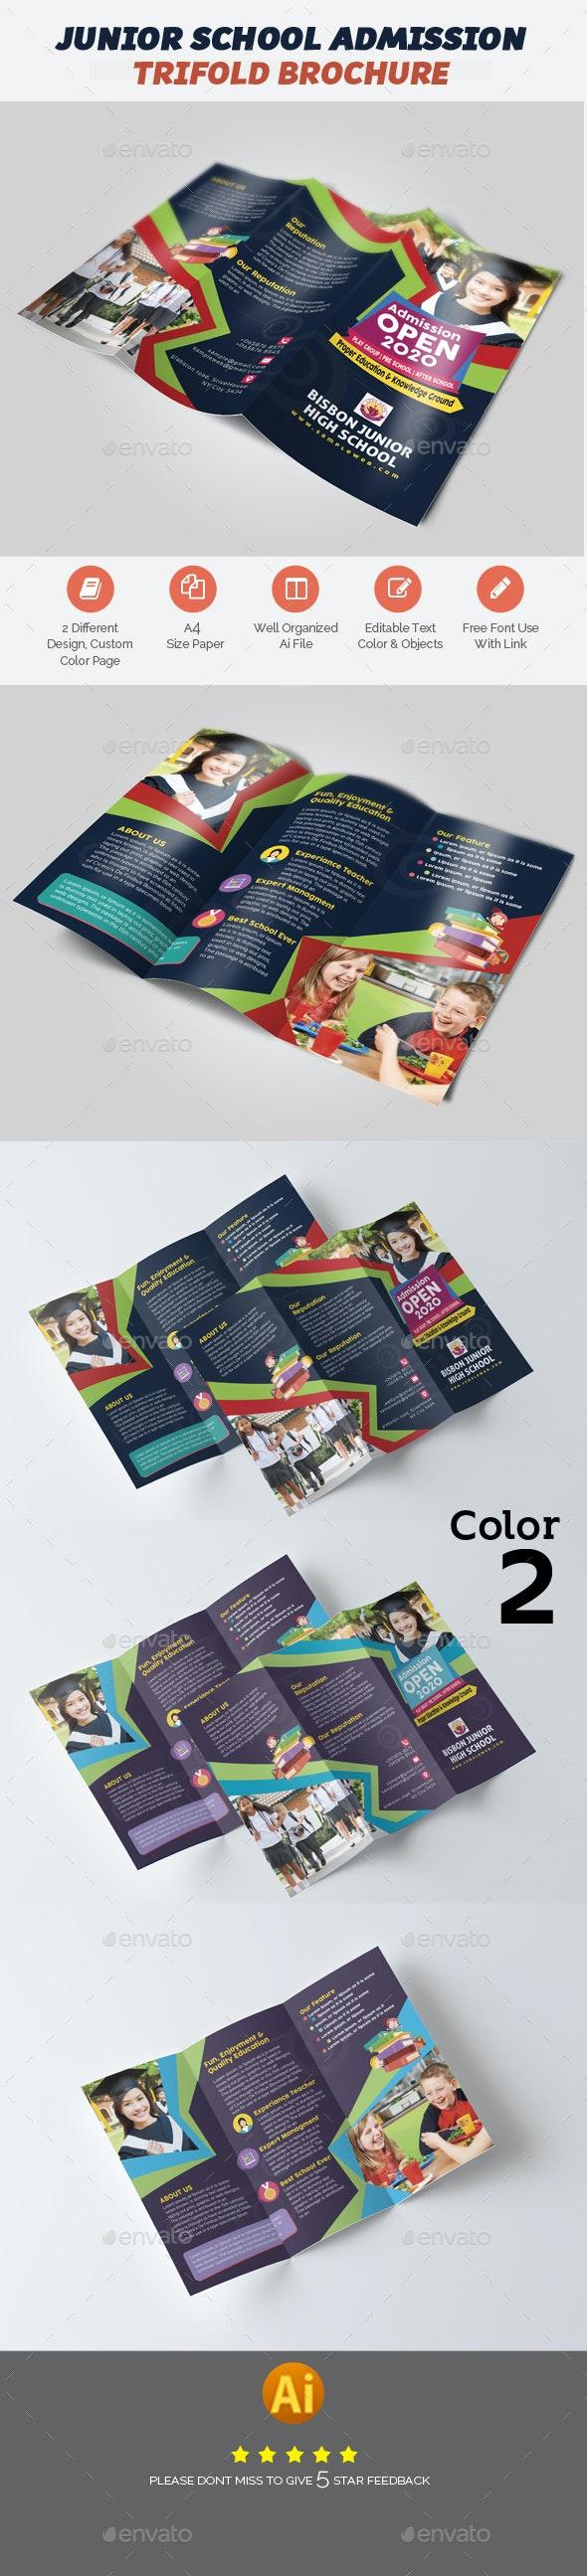 School Admission Brochure Template - Brochures Print Templates